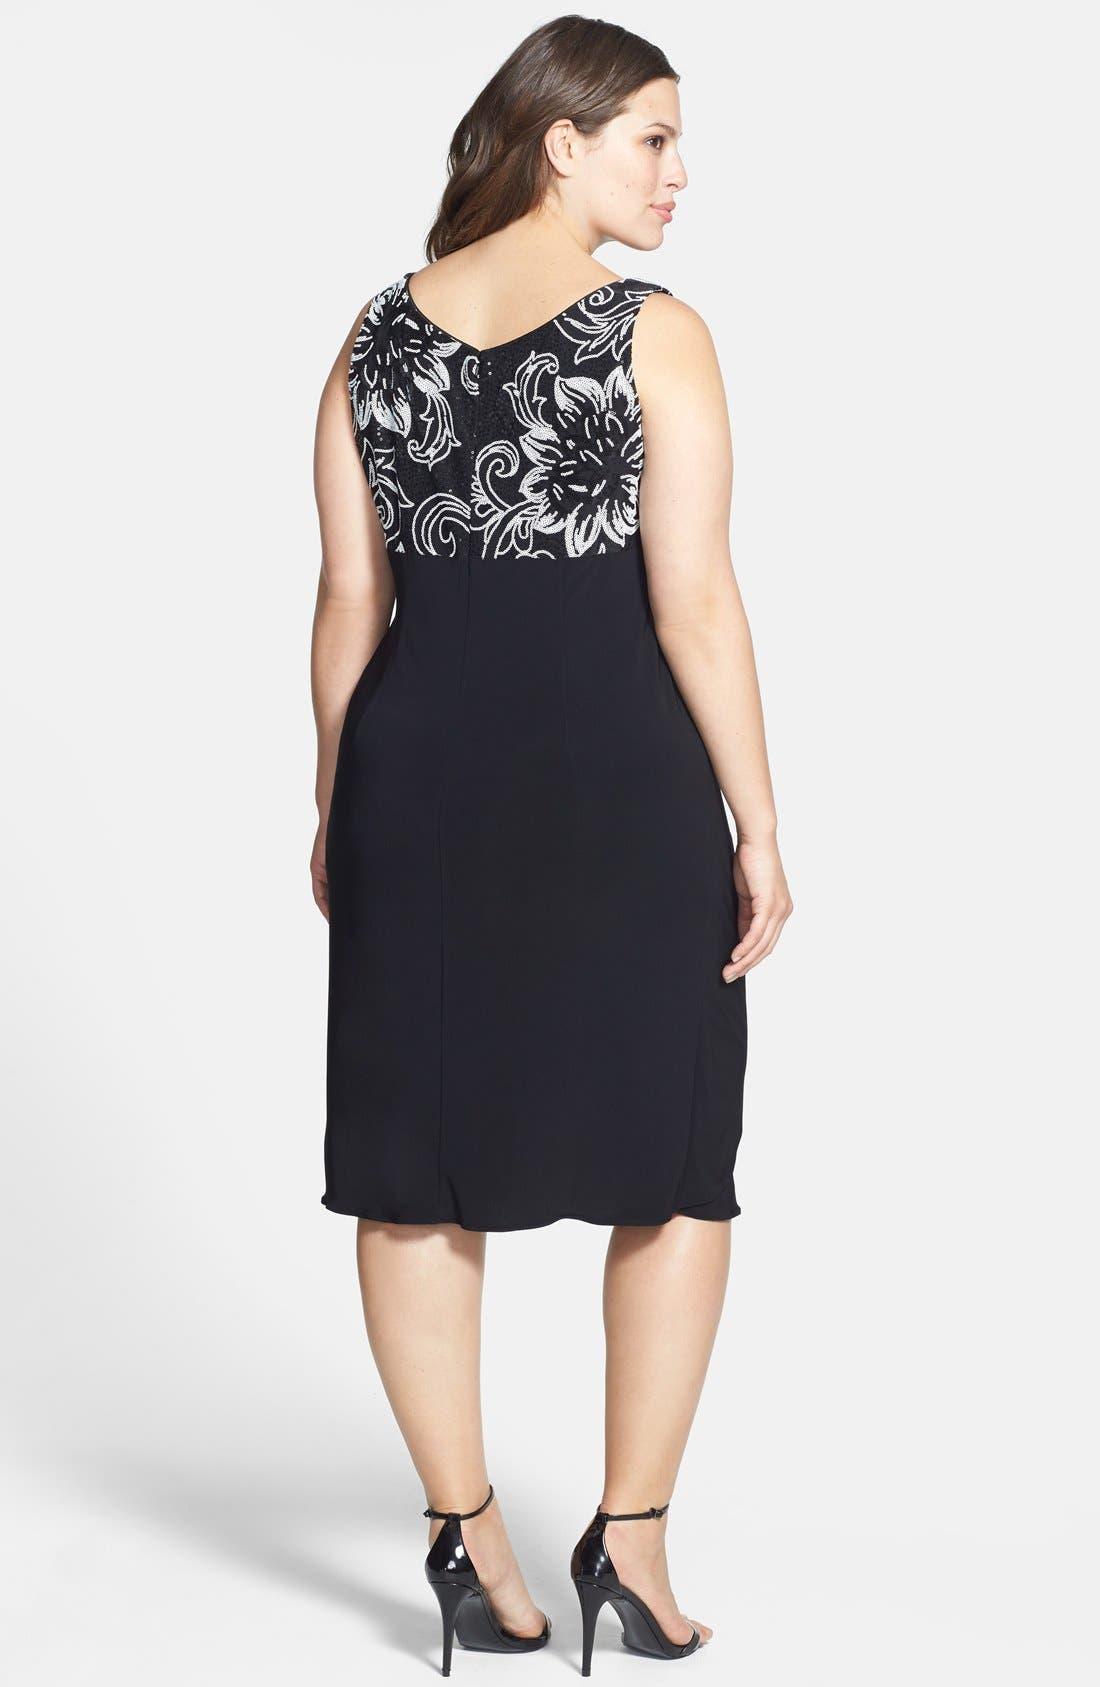 Alternate Image 3  - Alex Evenings Sequin Patterned Dress & Jacket (Plus Size)